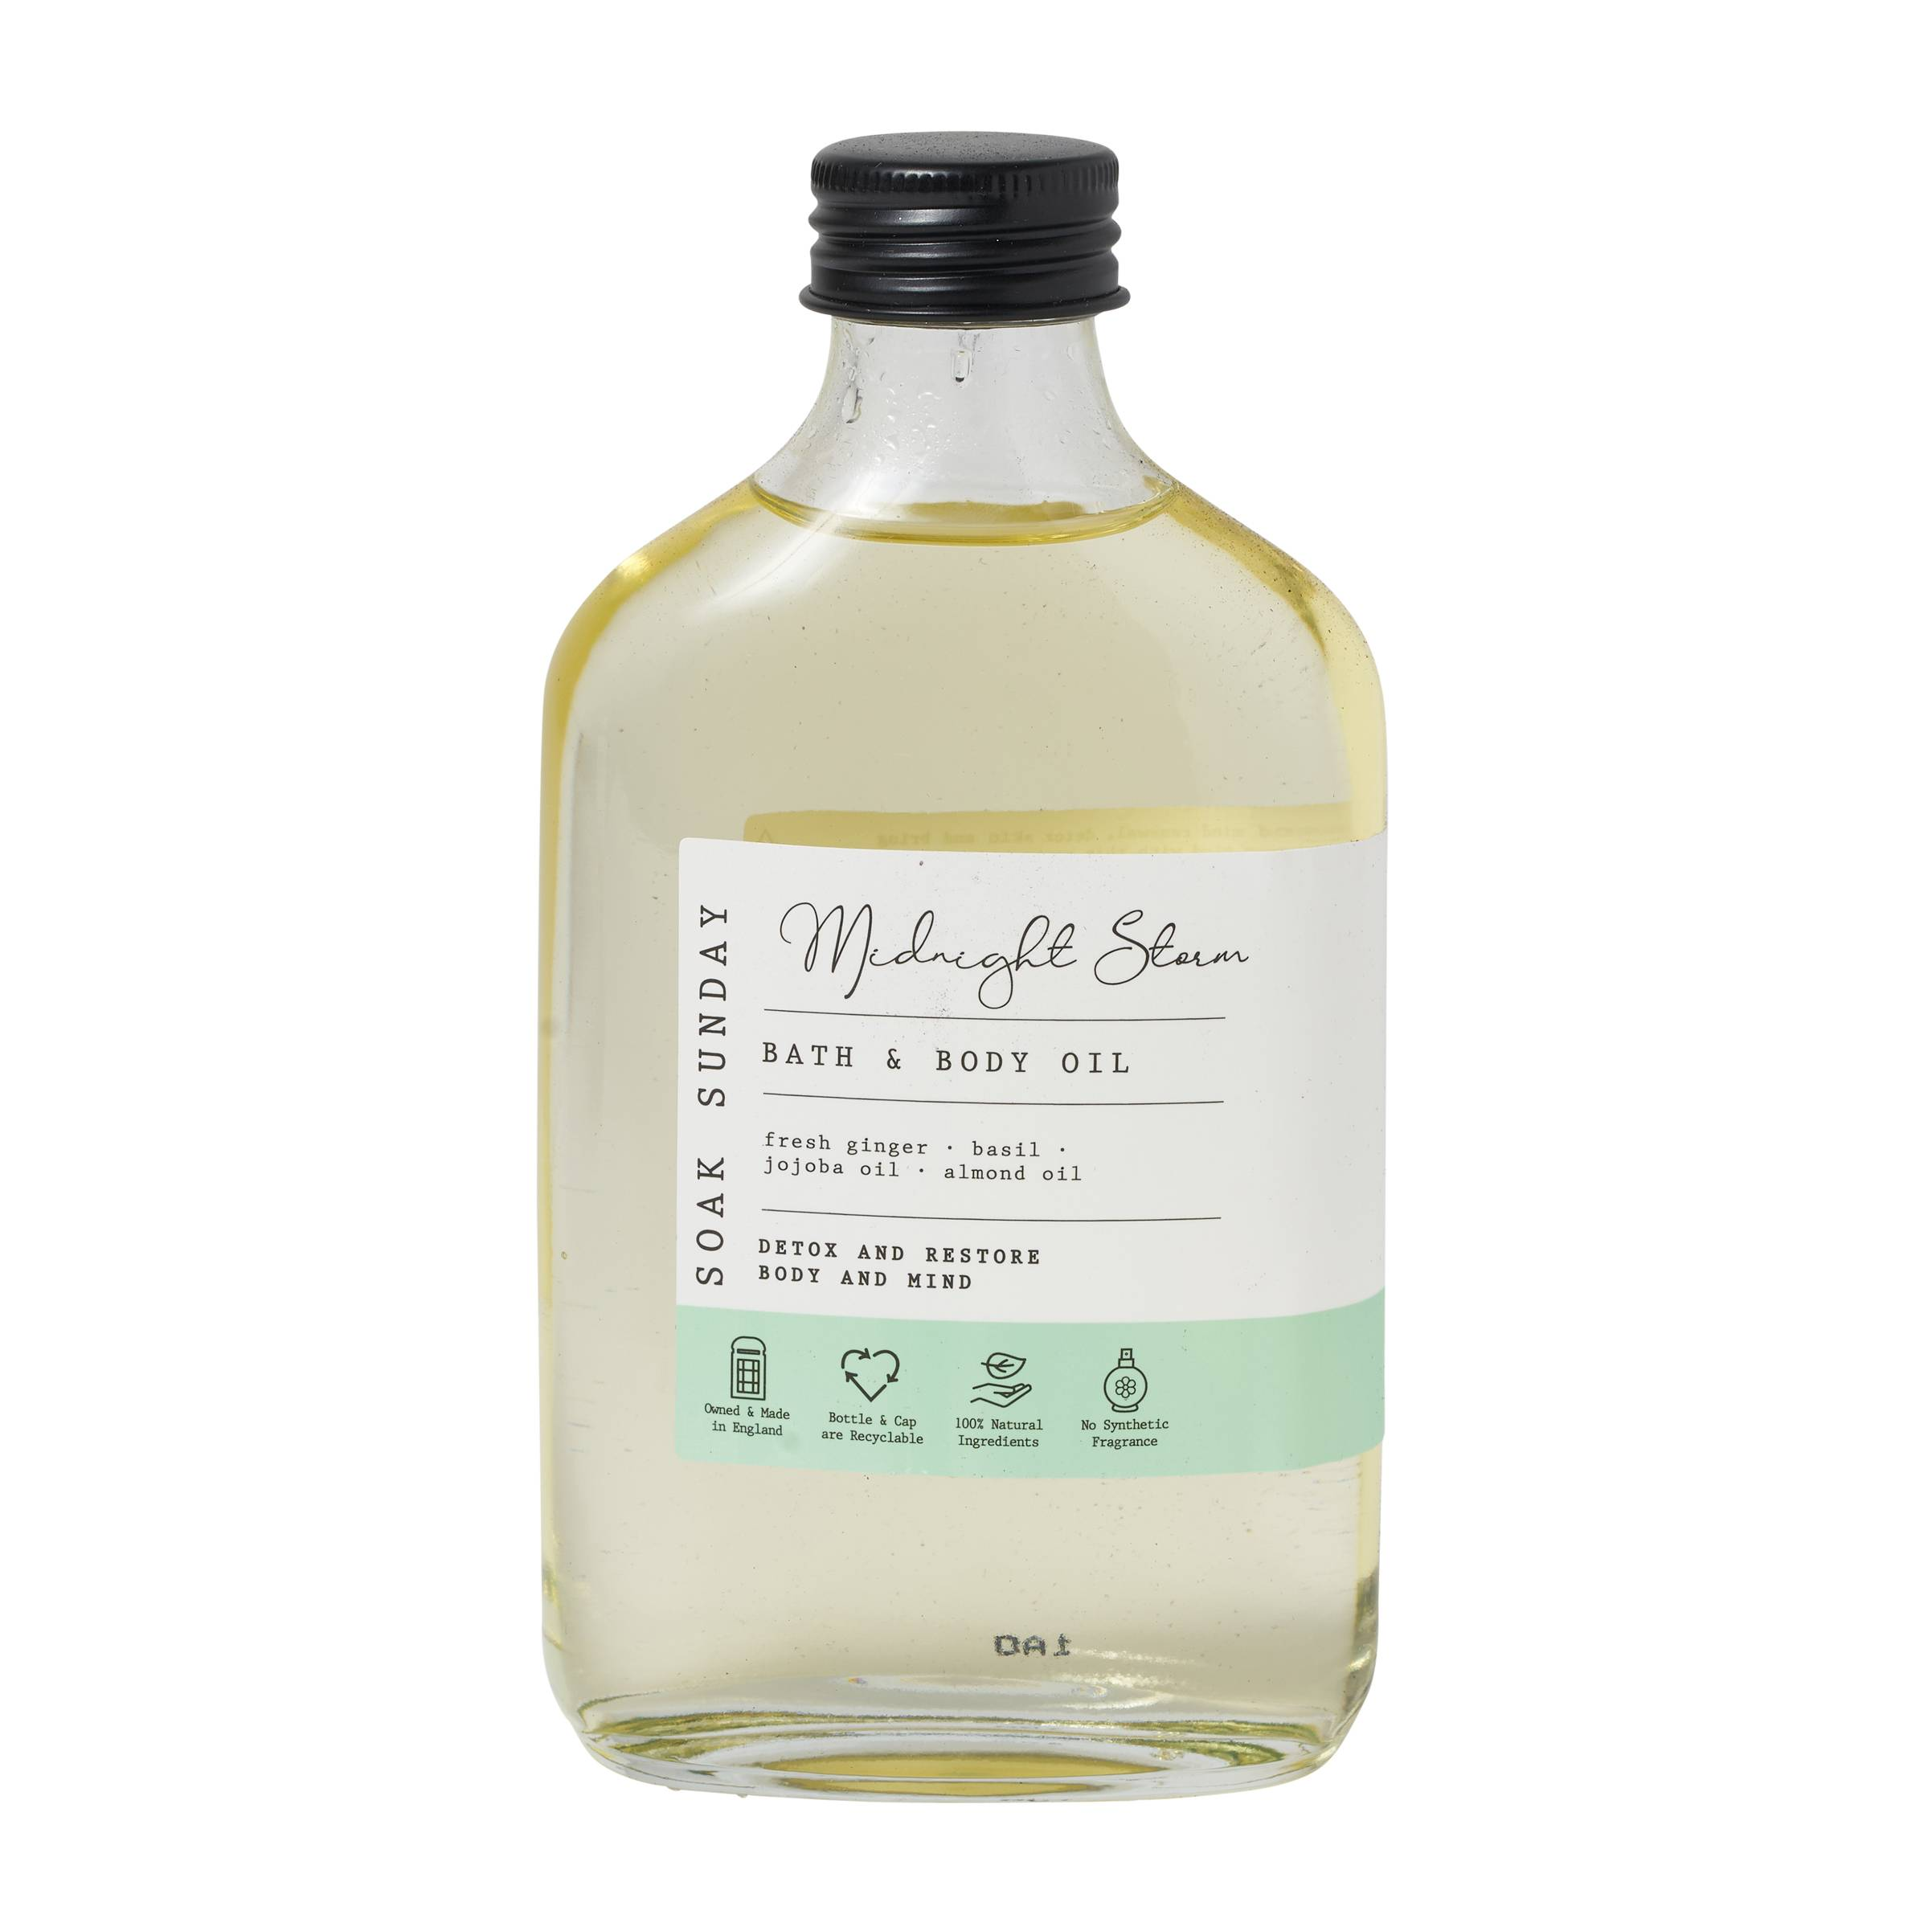 Soak Sunday Midnight Storm Bath & Body Oil 200ml